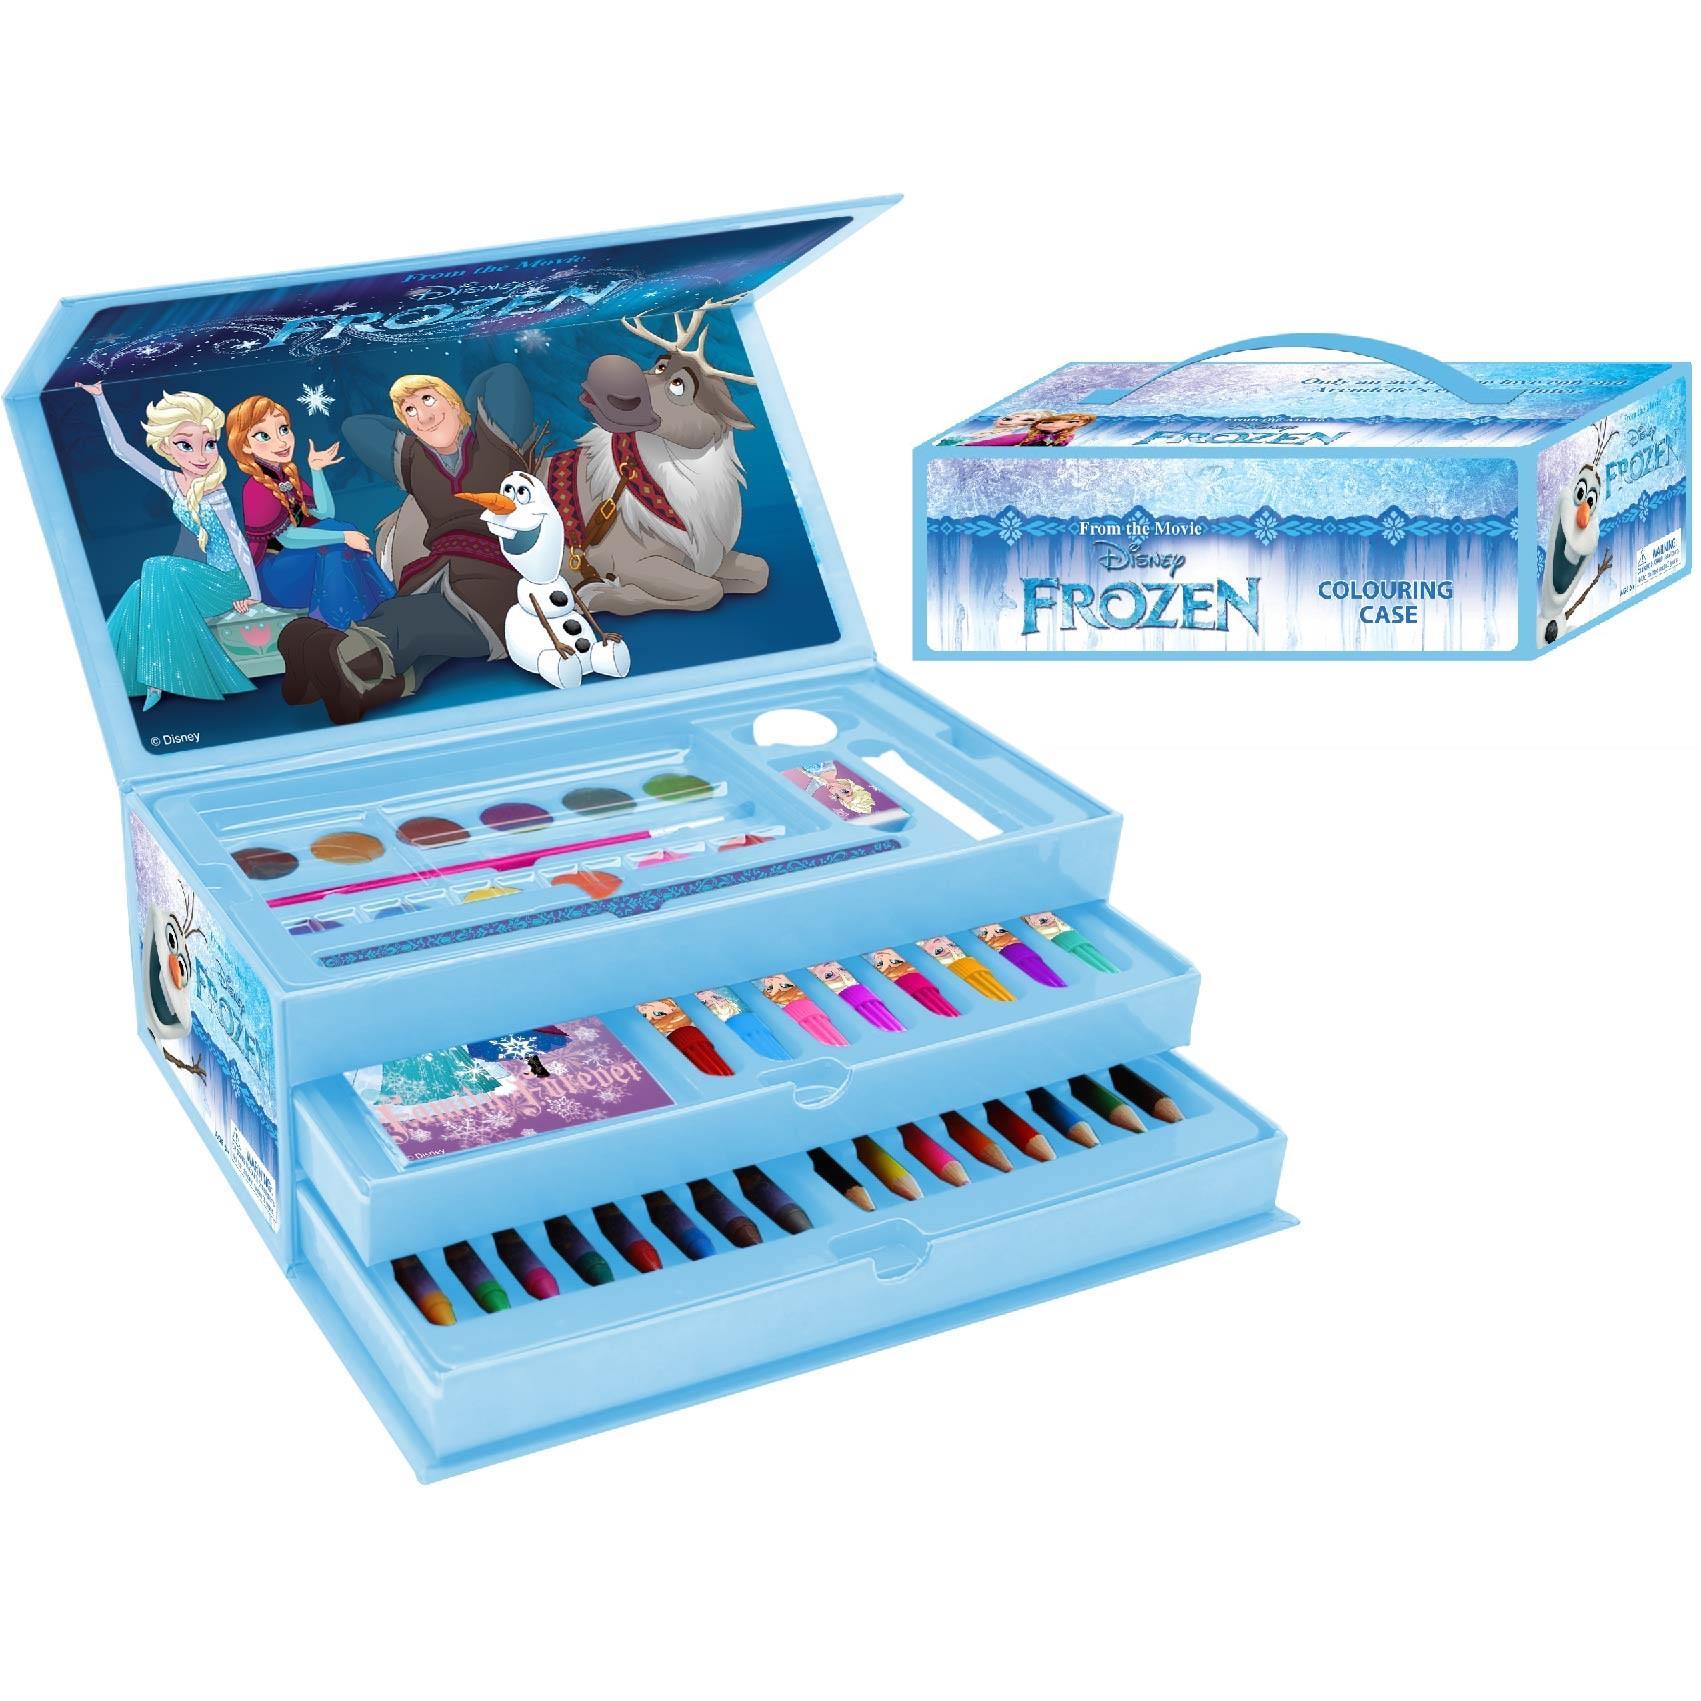 thumbnail 13 - Disney Frozen 2 Elsa Stationary Gift Set Case Chest Pencil Case Stocking Filler